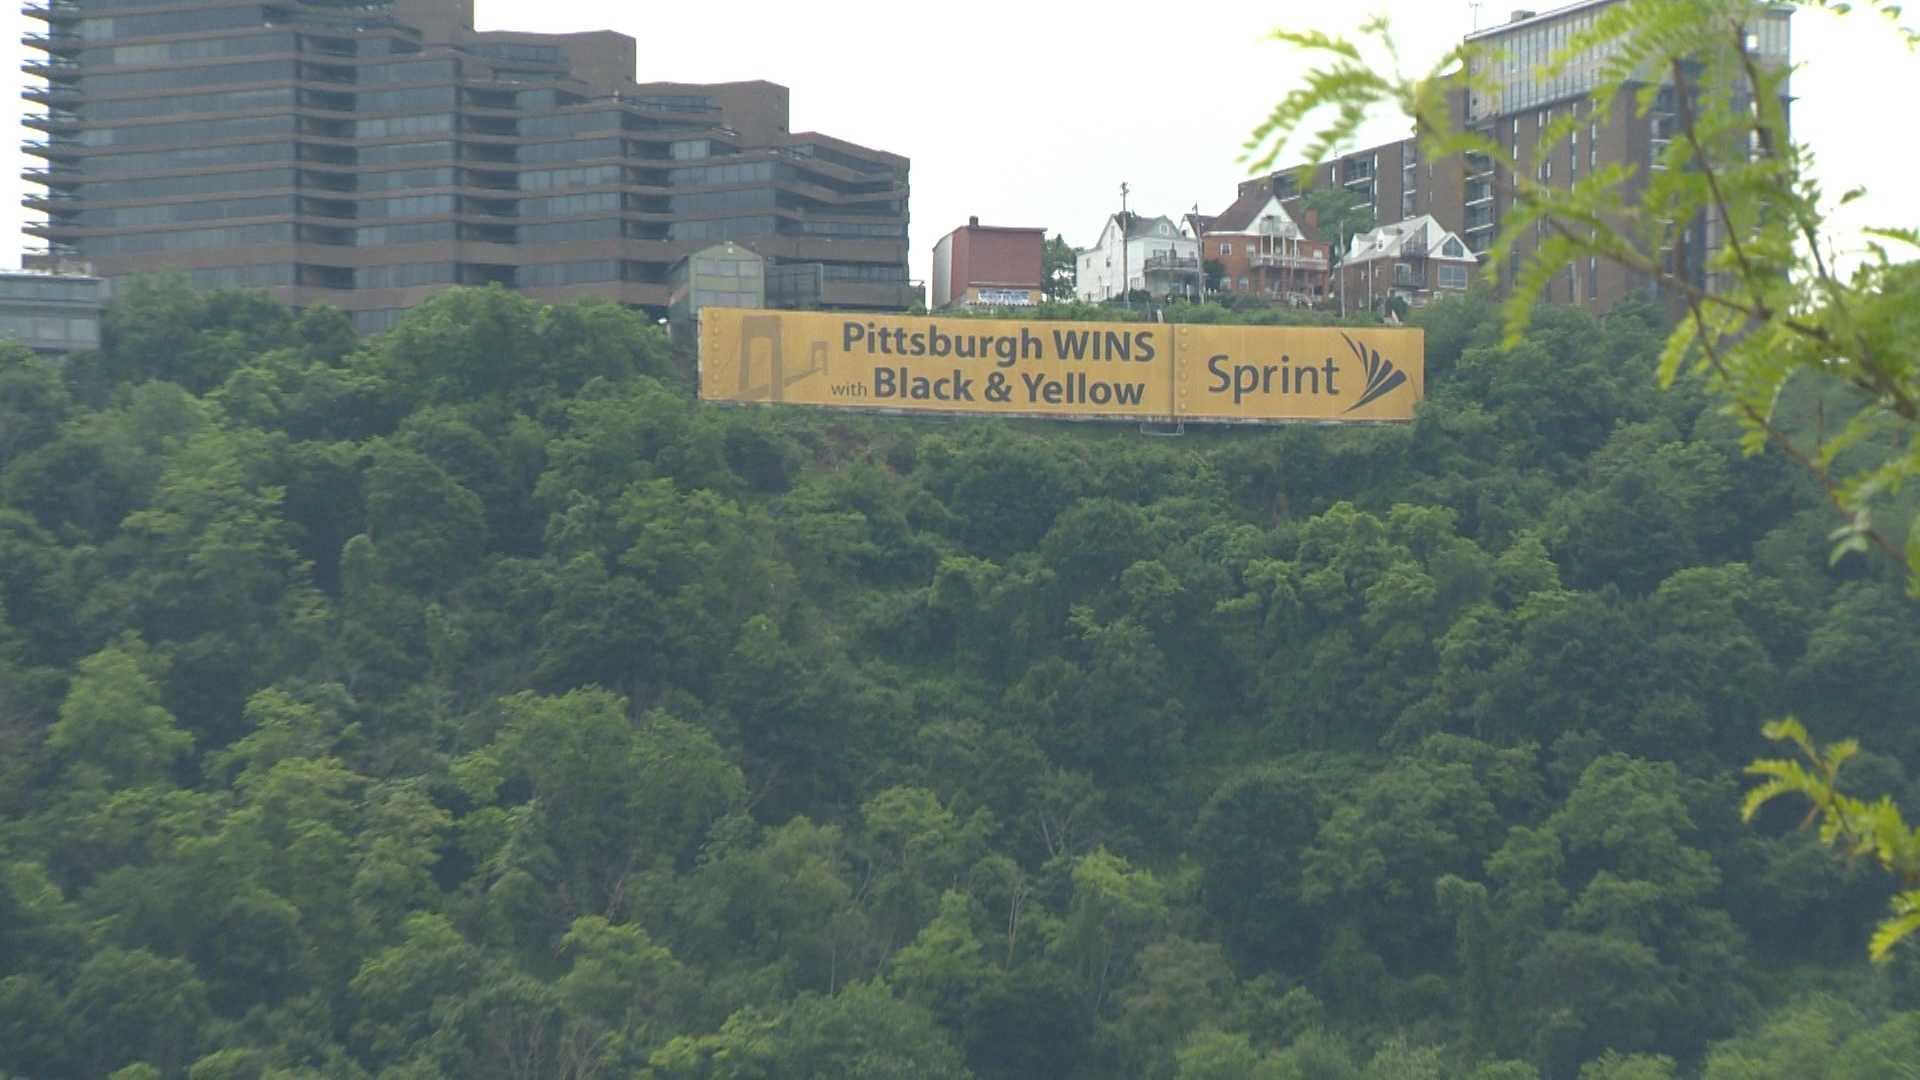 Sprint sign - Mount Washington